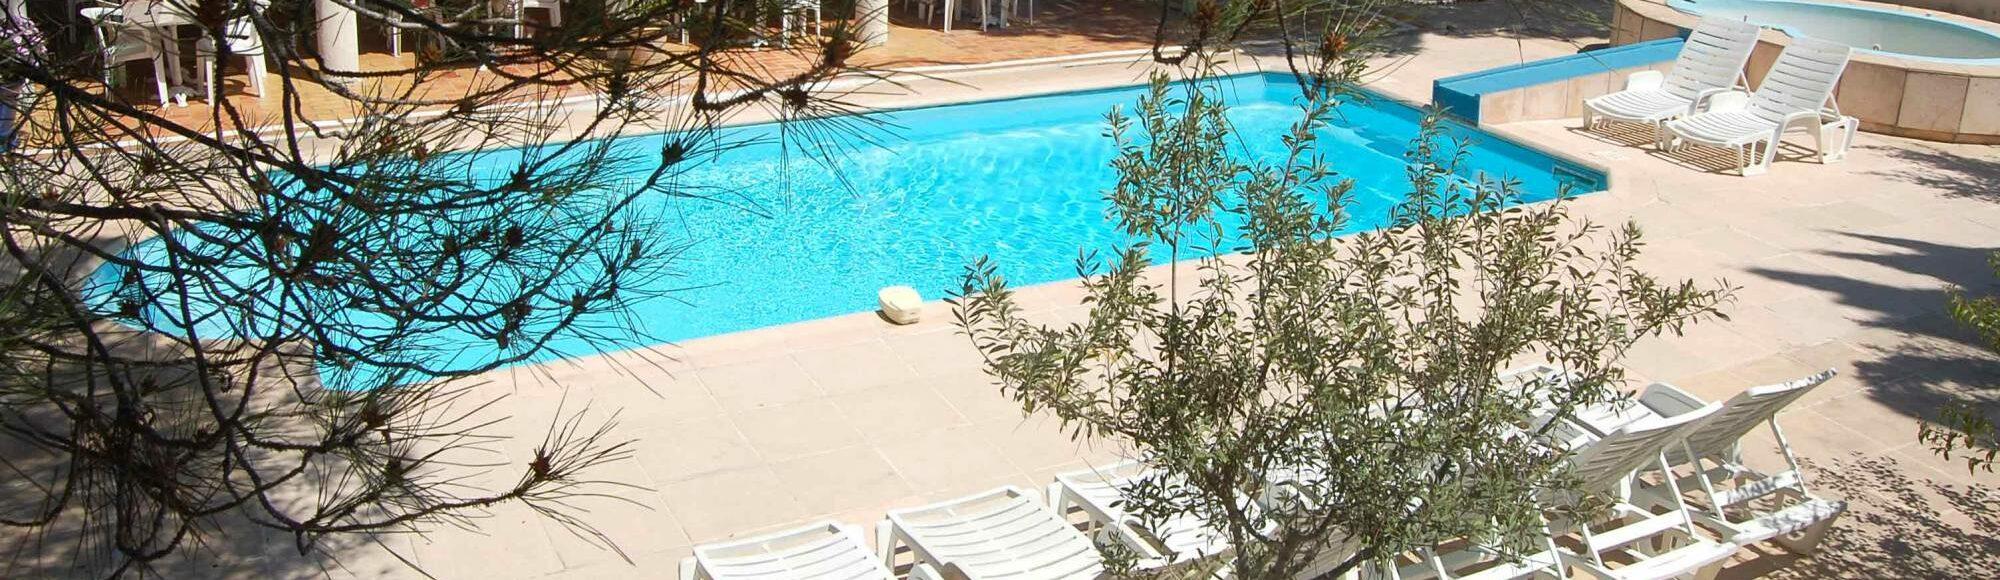 alba flora hotel toulon hyeres var